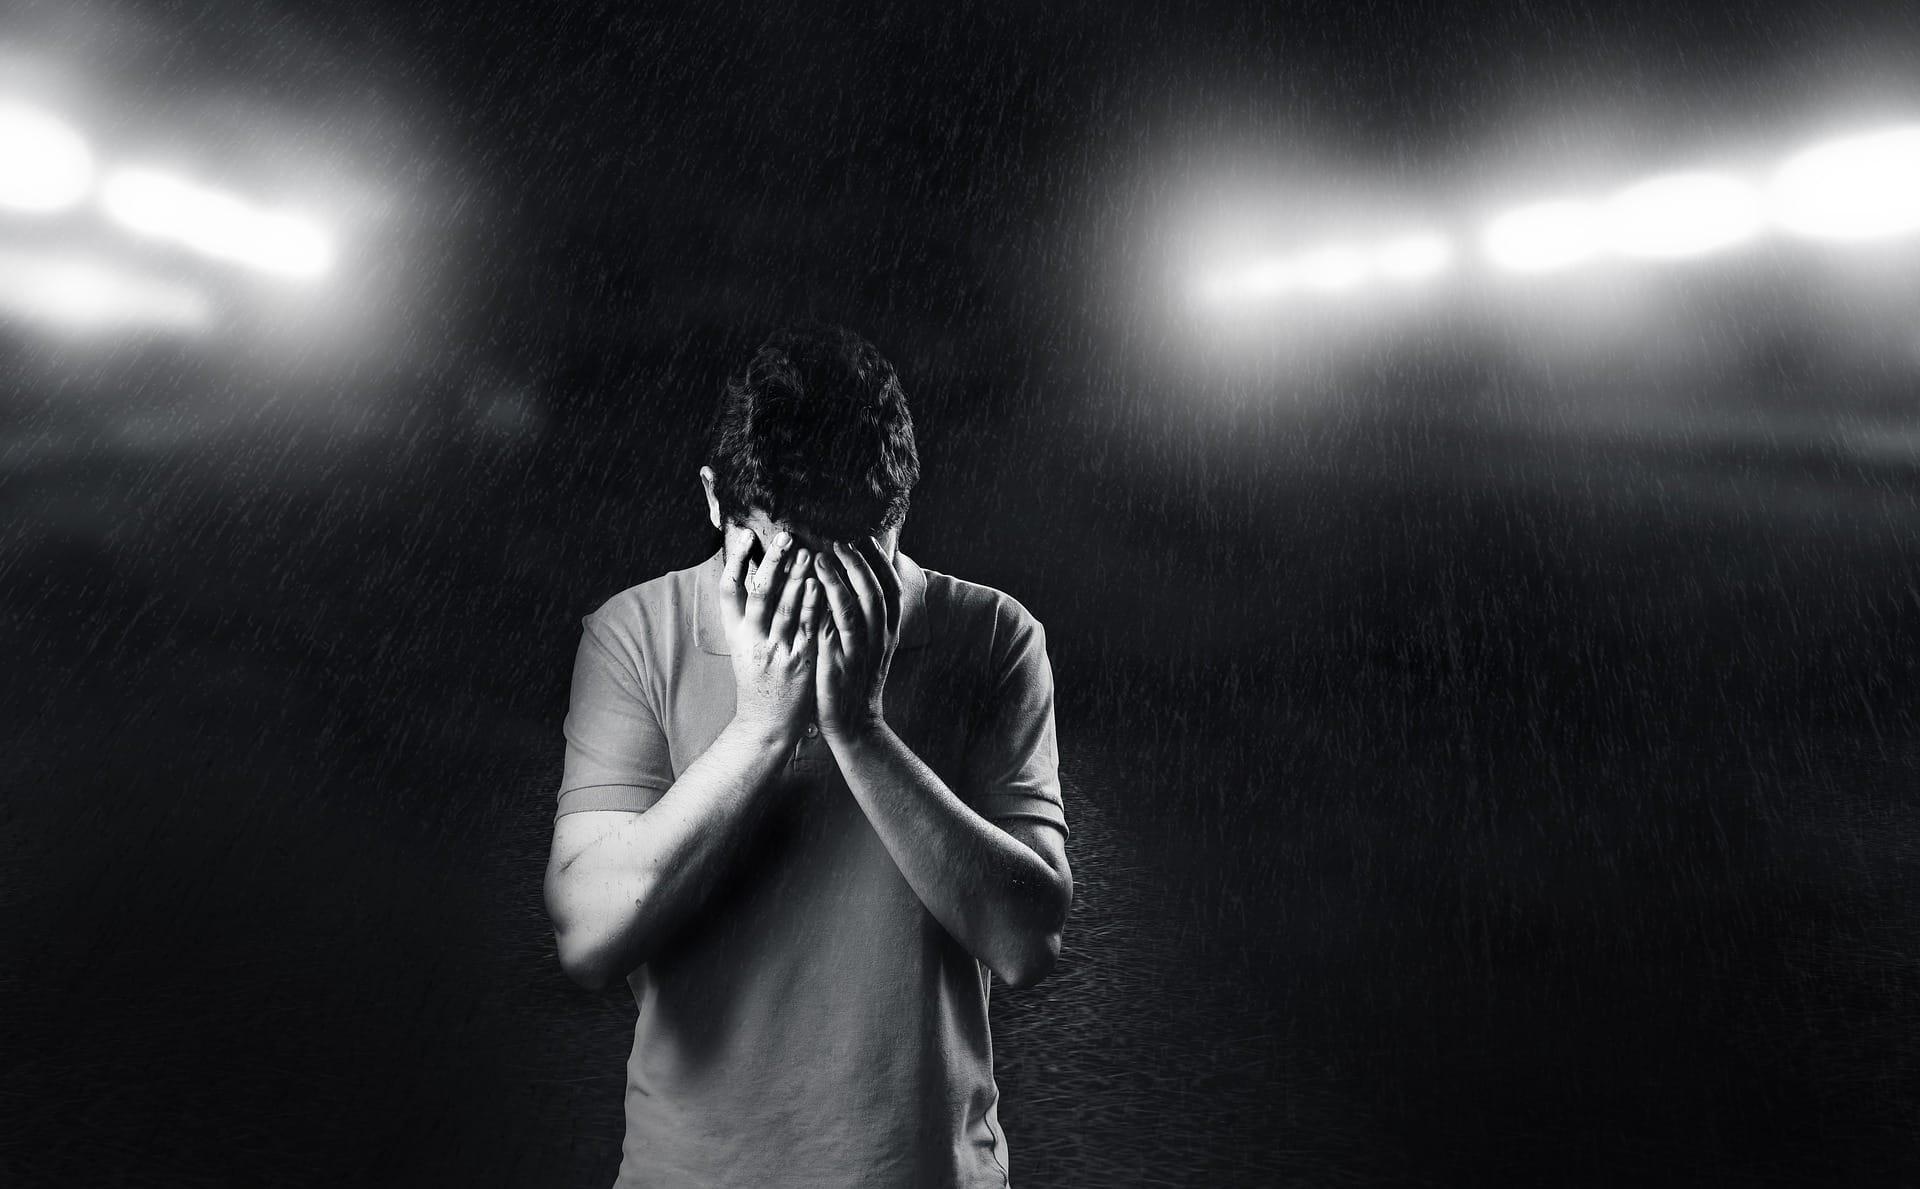 Ibiza Calm - Mens' Mental Health and Addiction